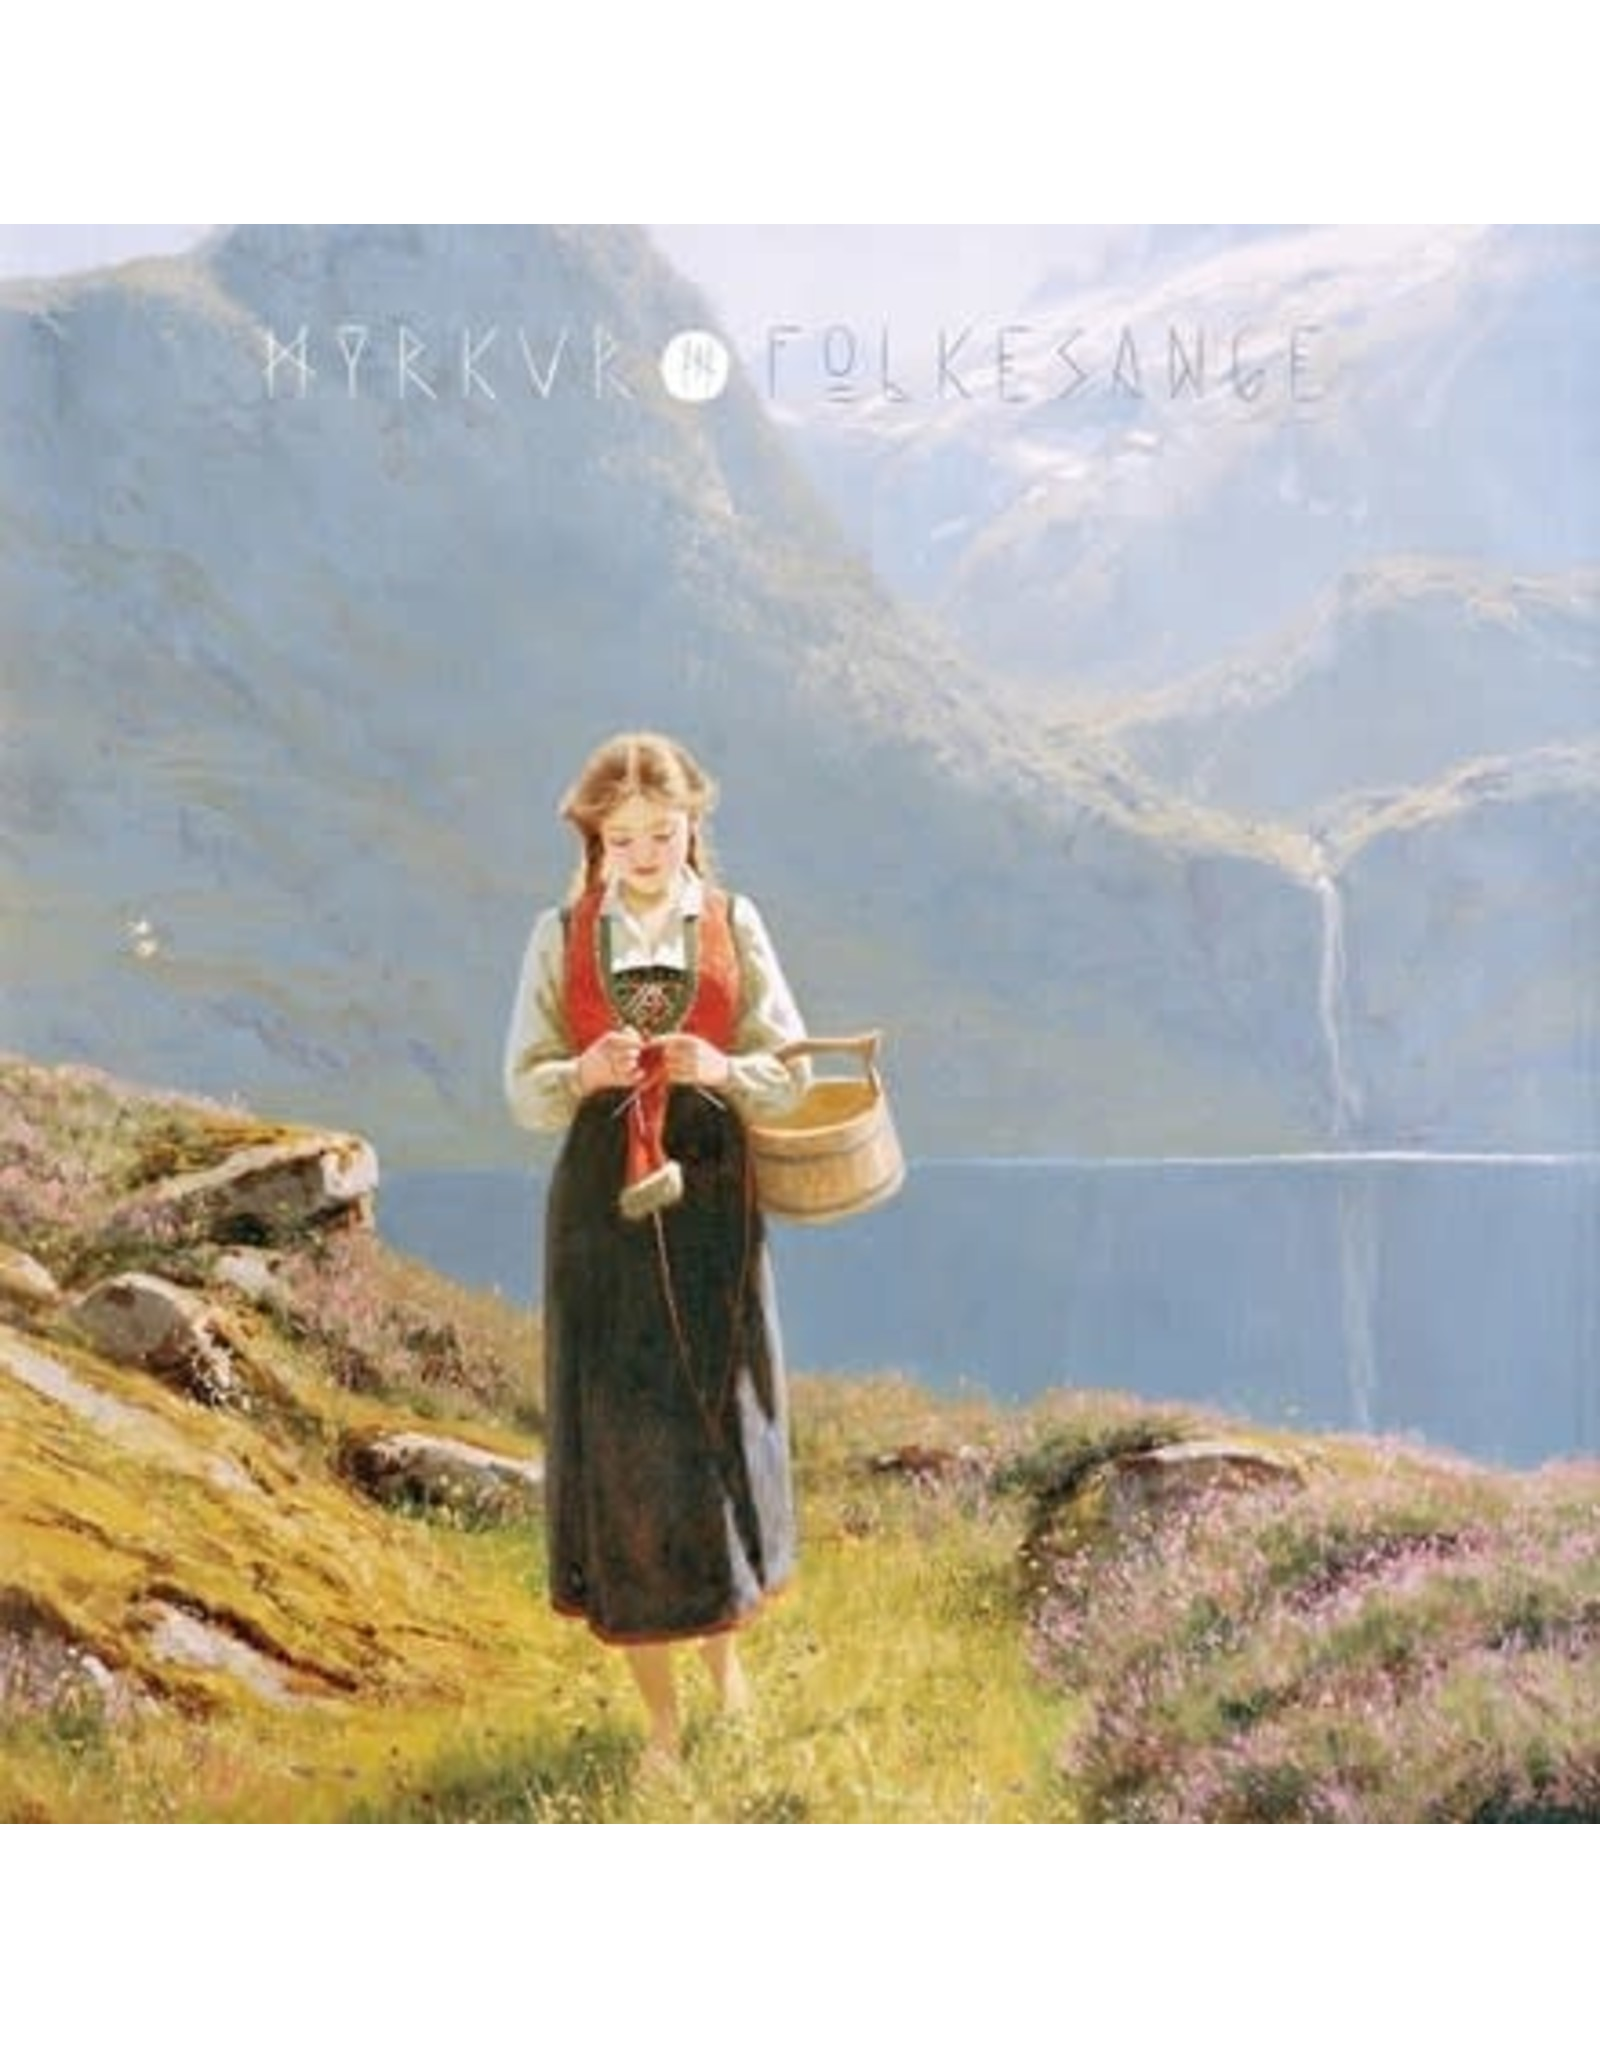 Relapse Myrkur: Folkesange LP